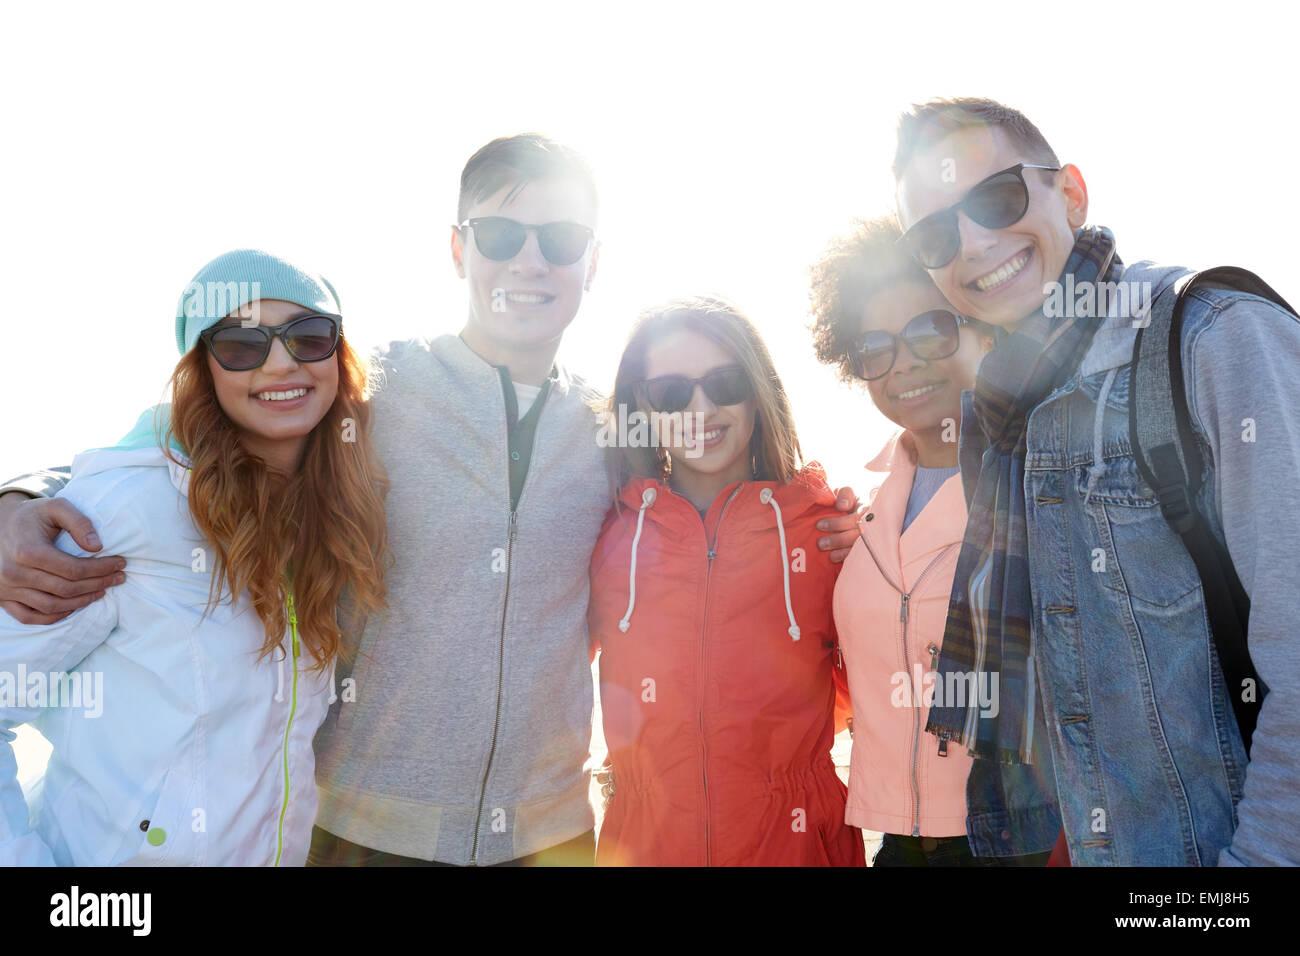 Heureux amis adolescents dans les tons hugging on street Photo Stock